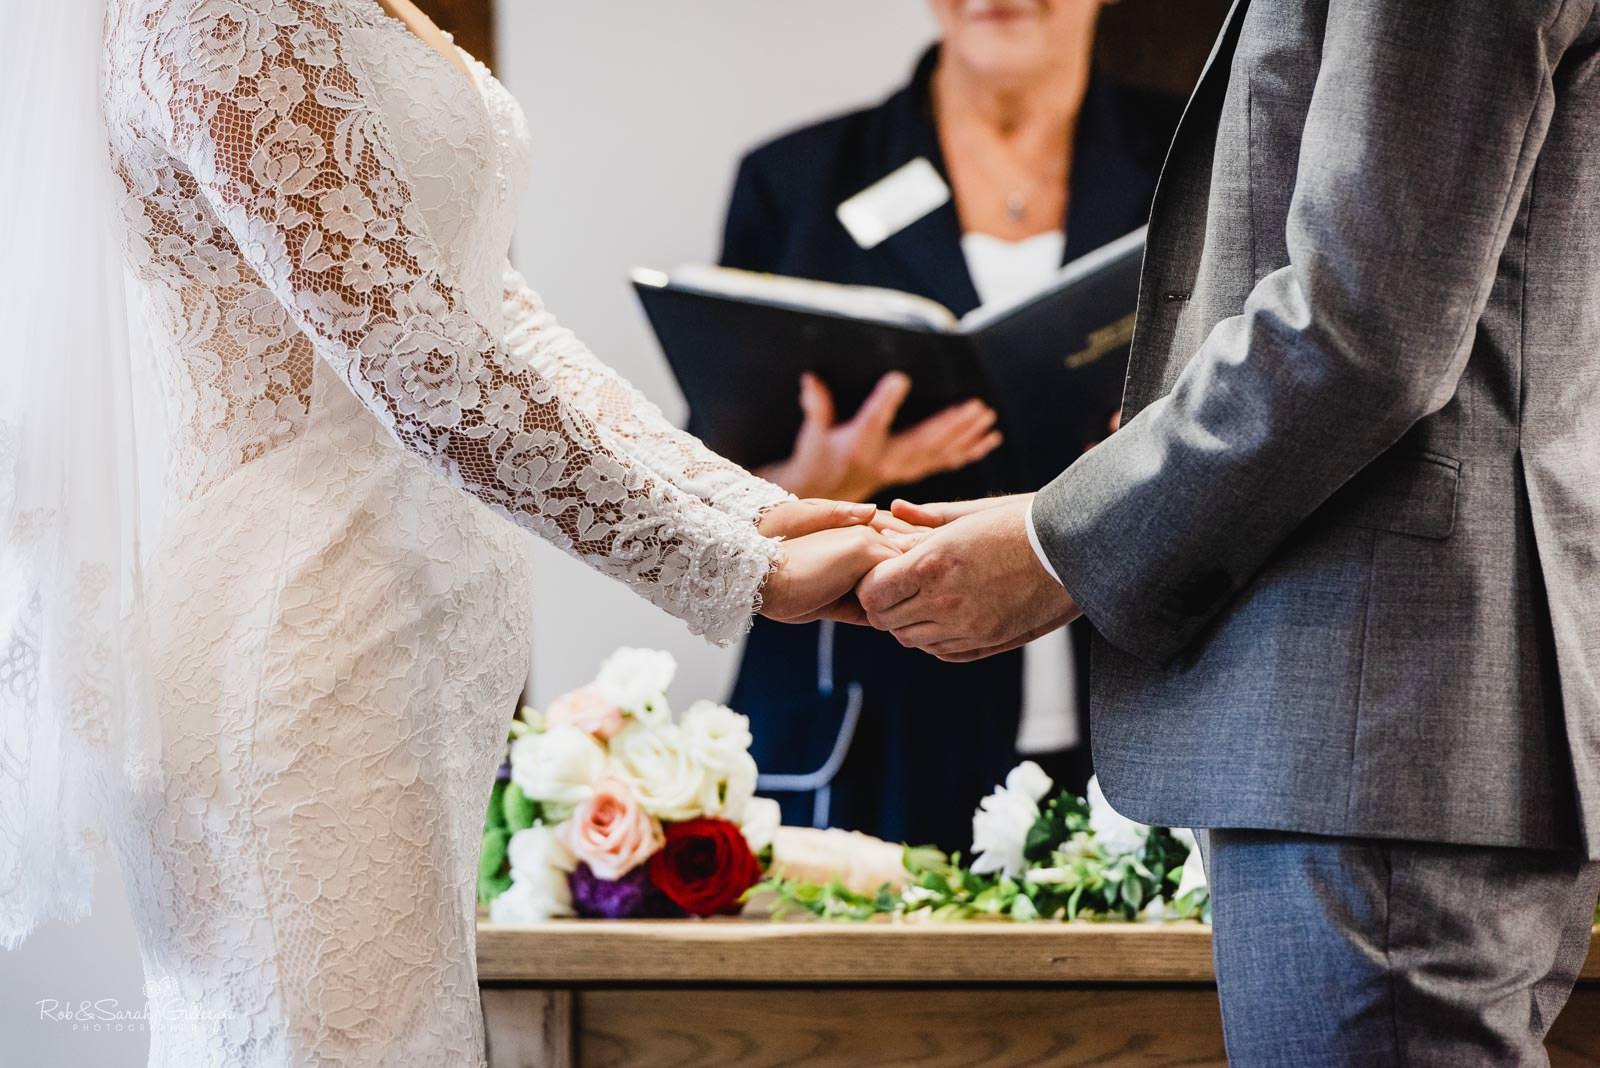 Wedding ceremony at Henley Room in Stratford upon Avon